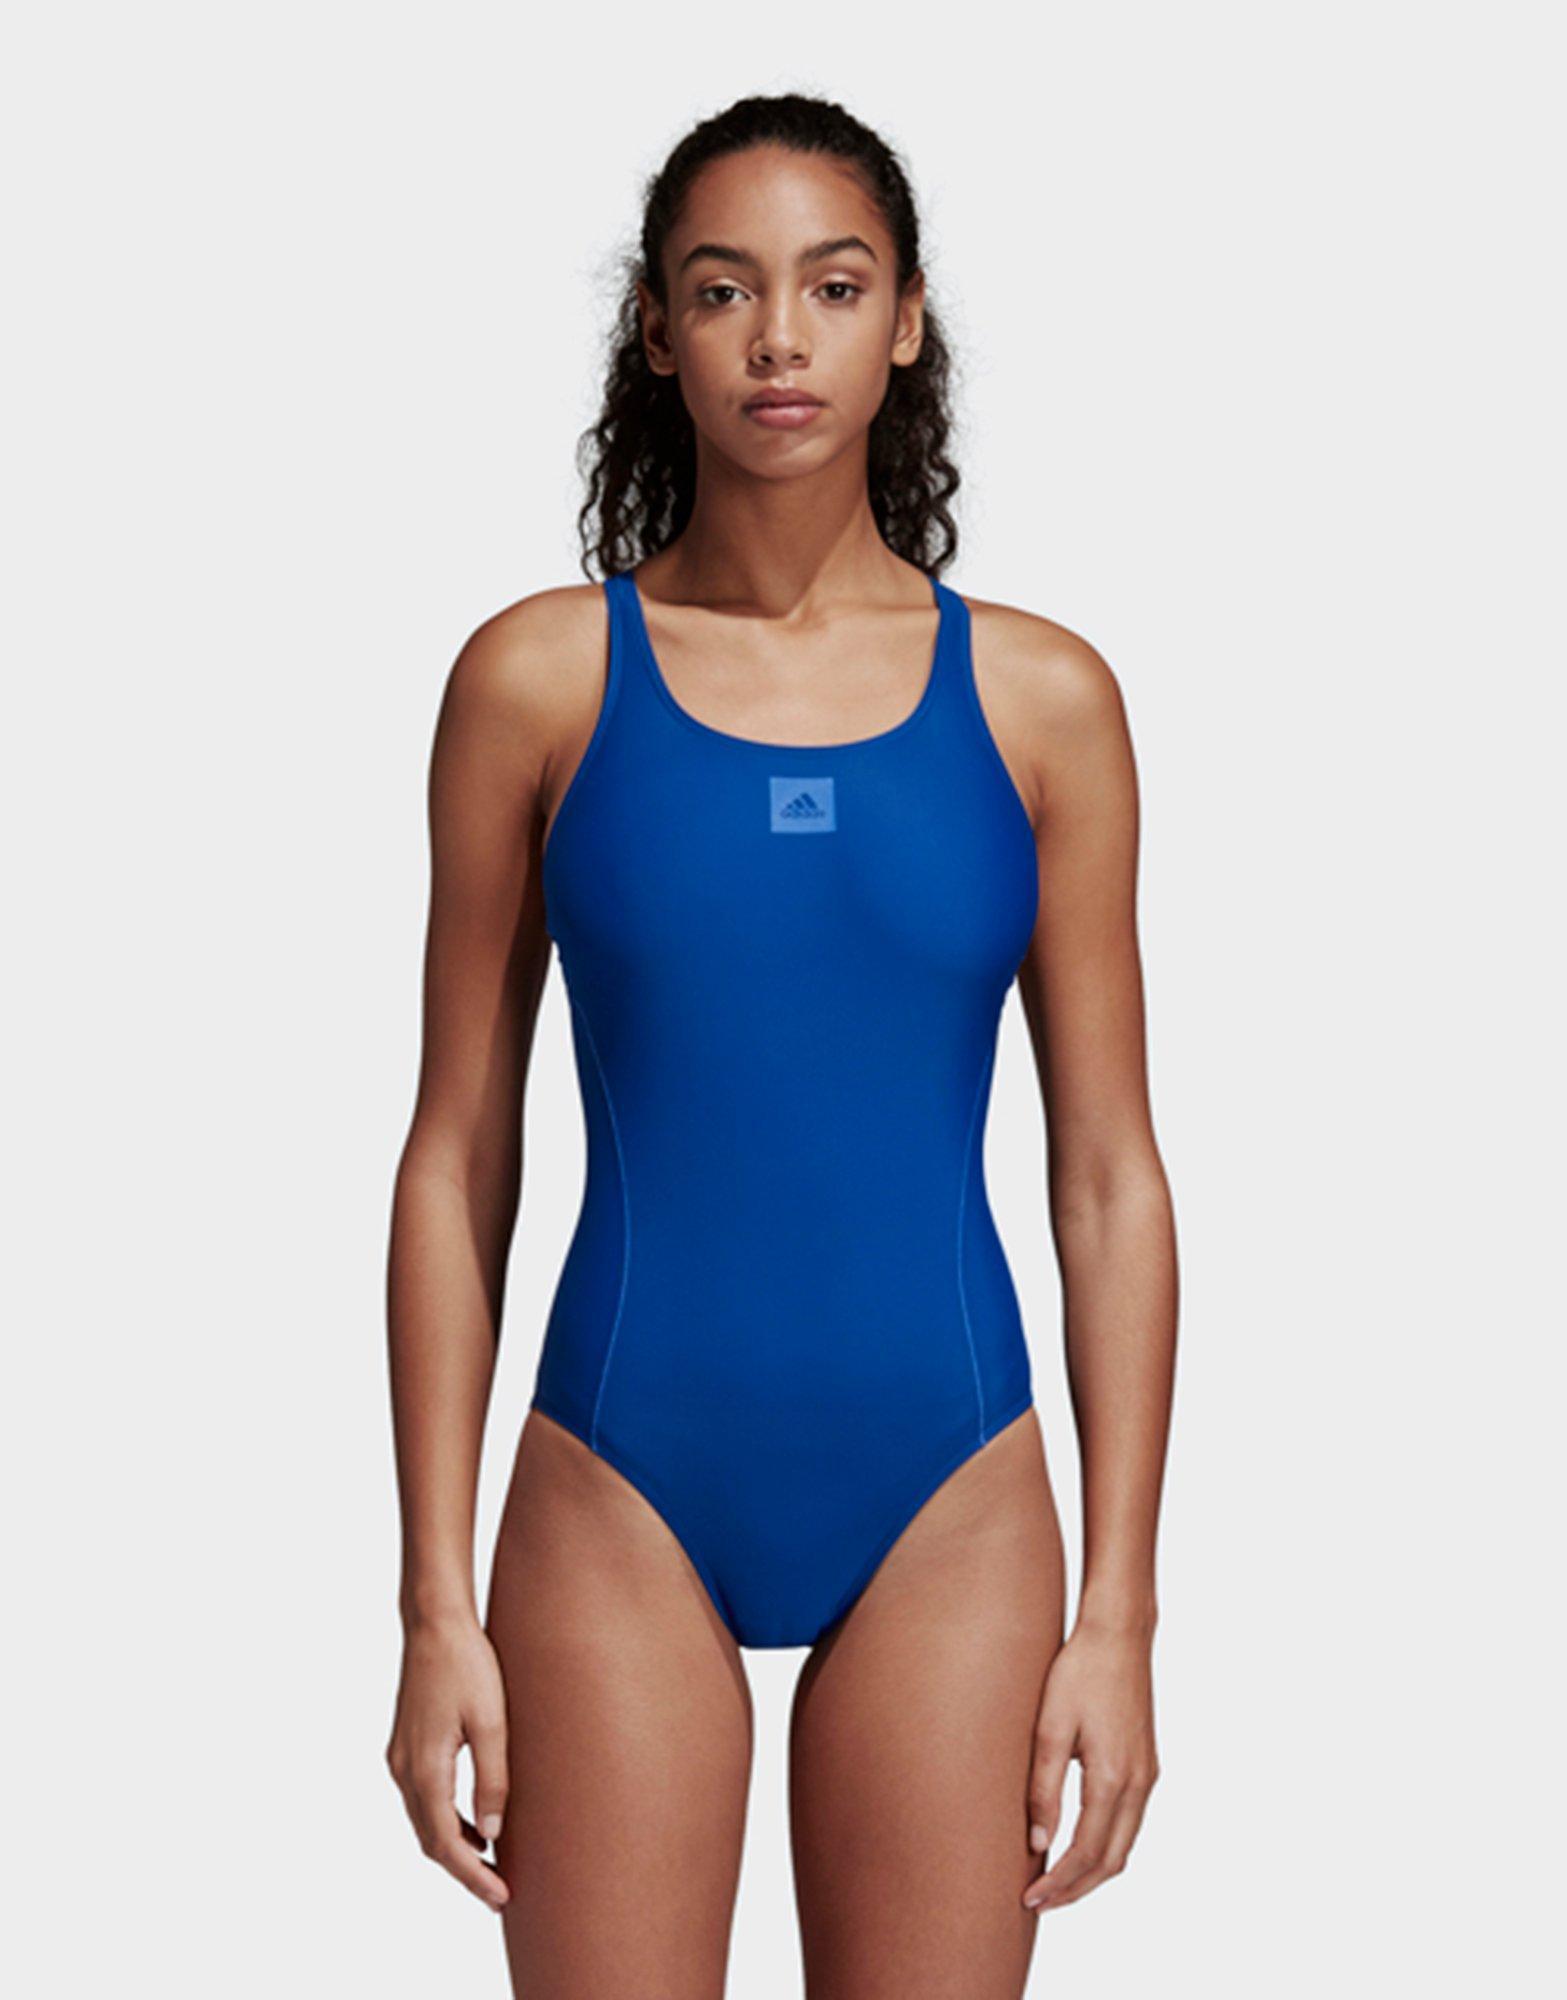 dea95711c6066 Adidas Essence Core Solid Swim Suit in Blue - Lyst